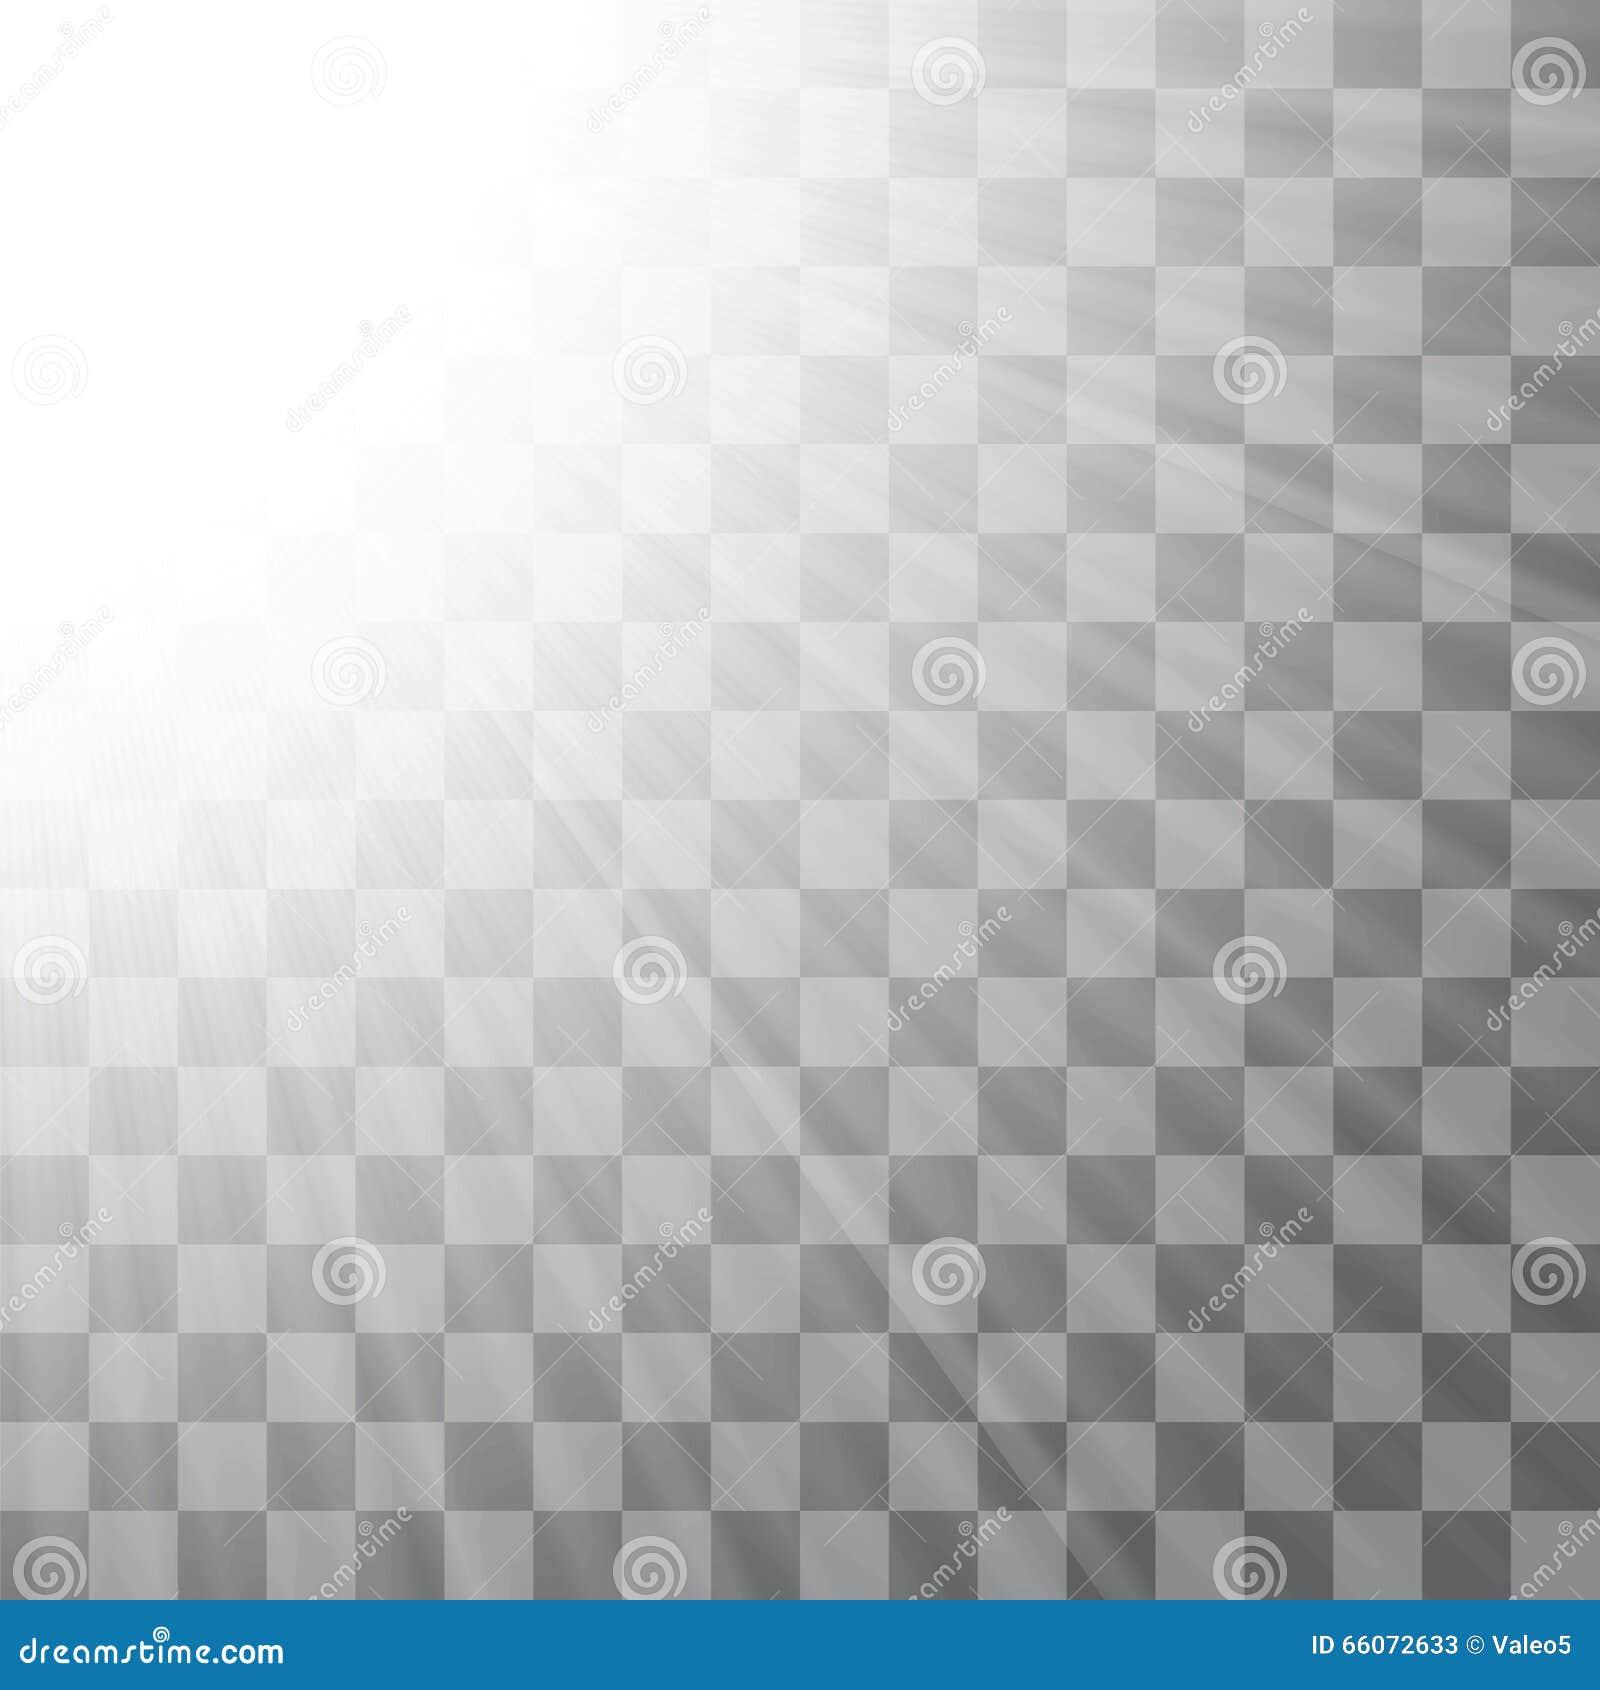 Transparent Light Background Stock Vector Illustration